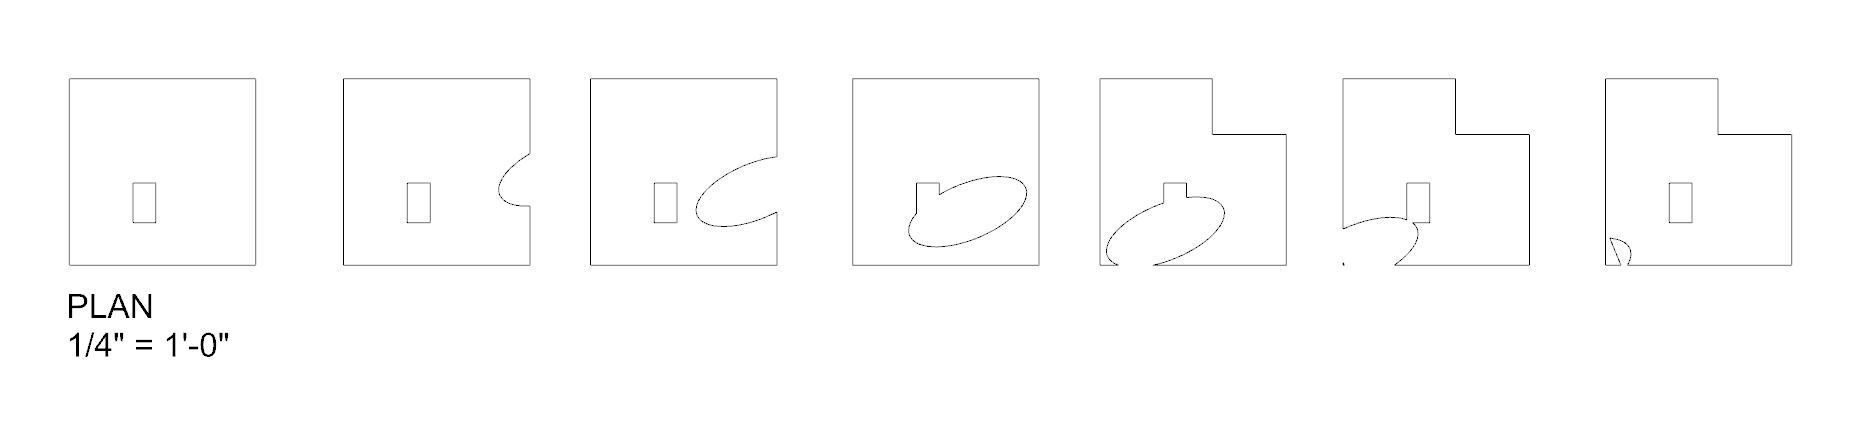 Rhino Drafting Notes 02 - Lines (Week 3) | Design